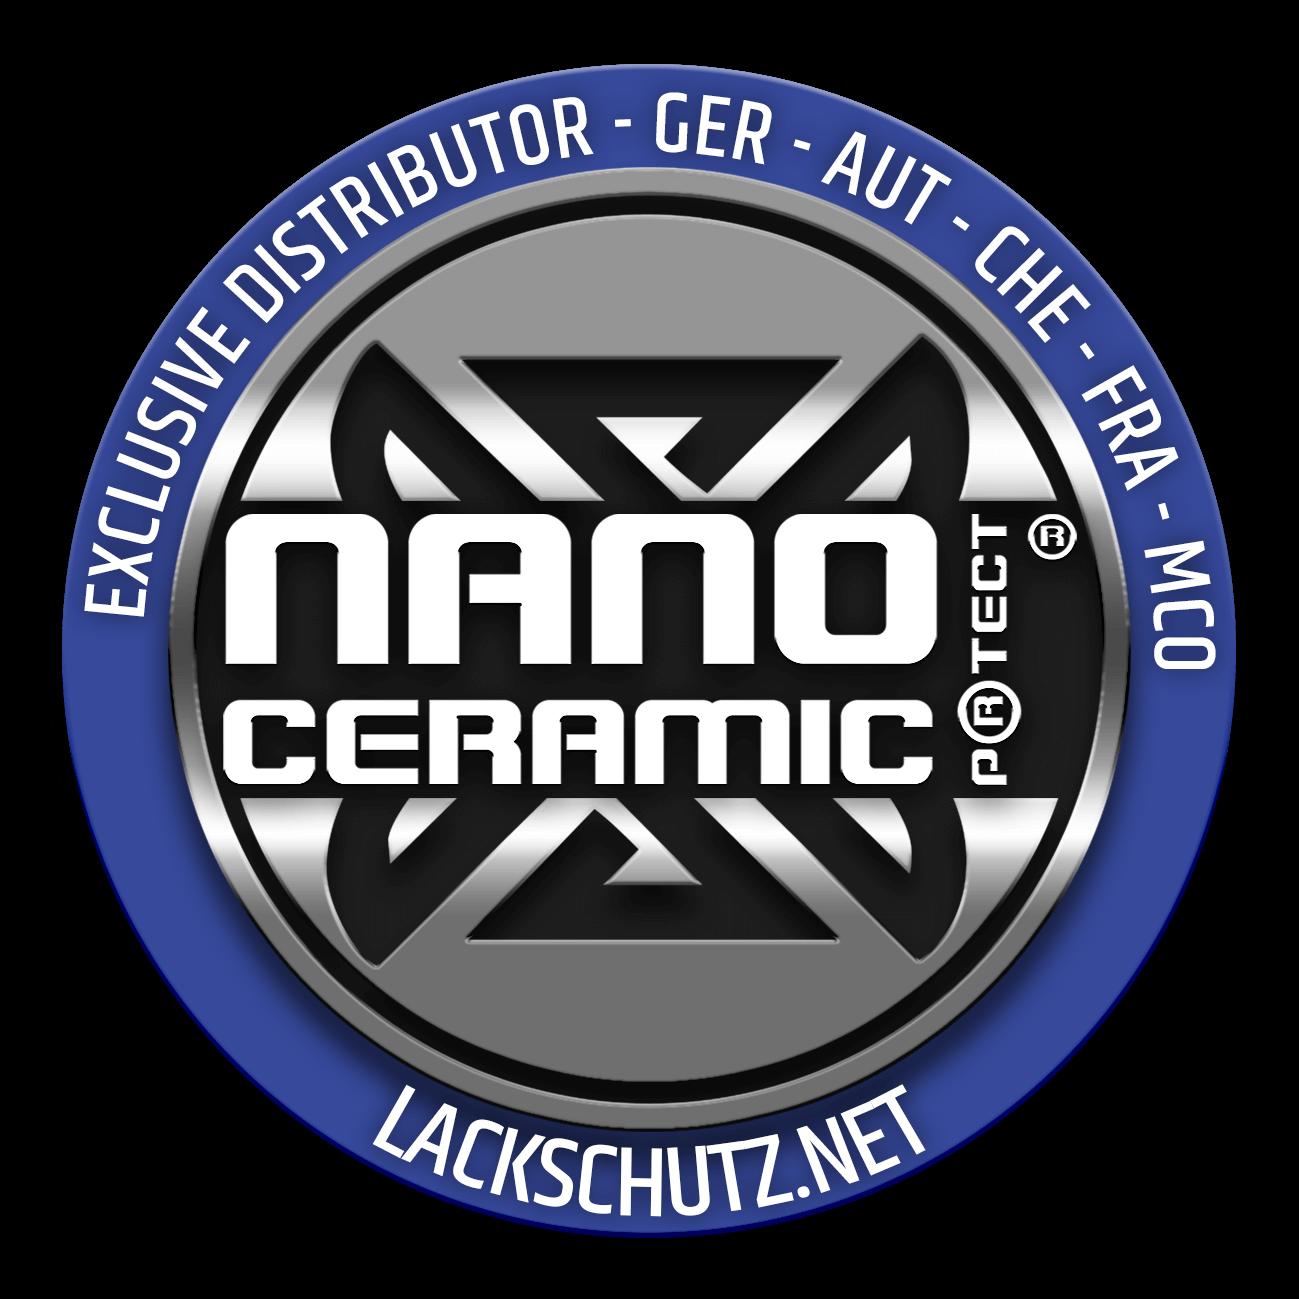 Autopflege Detailing Produkte Onlineshop powered by Lackschutz.net